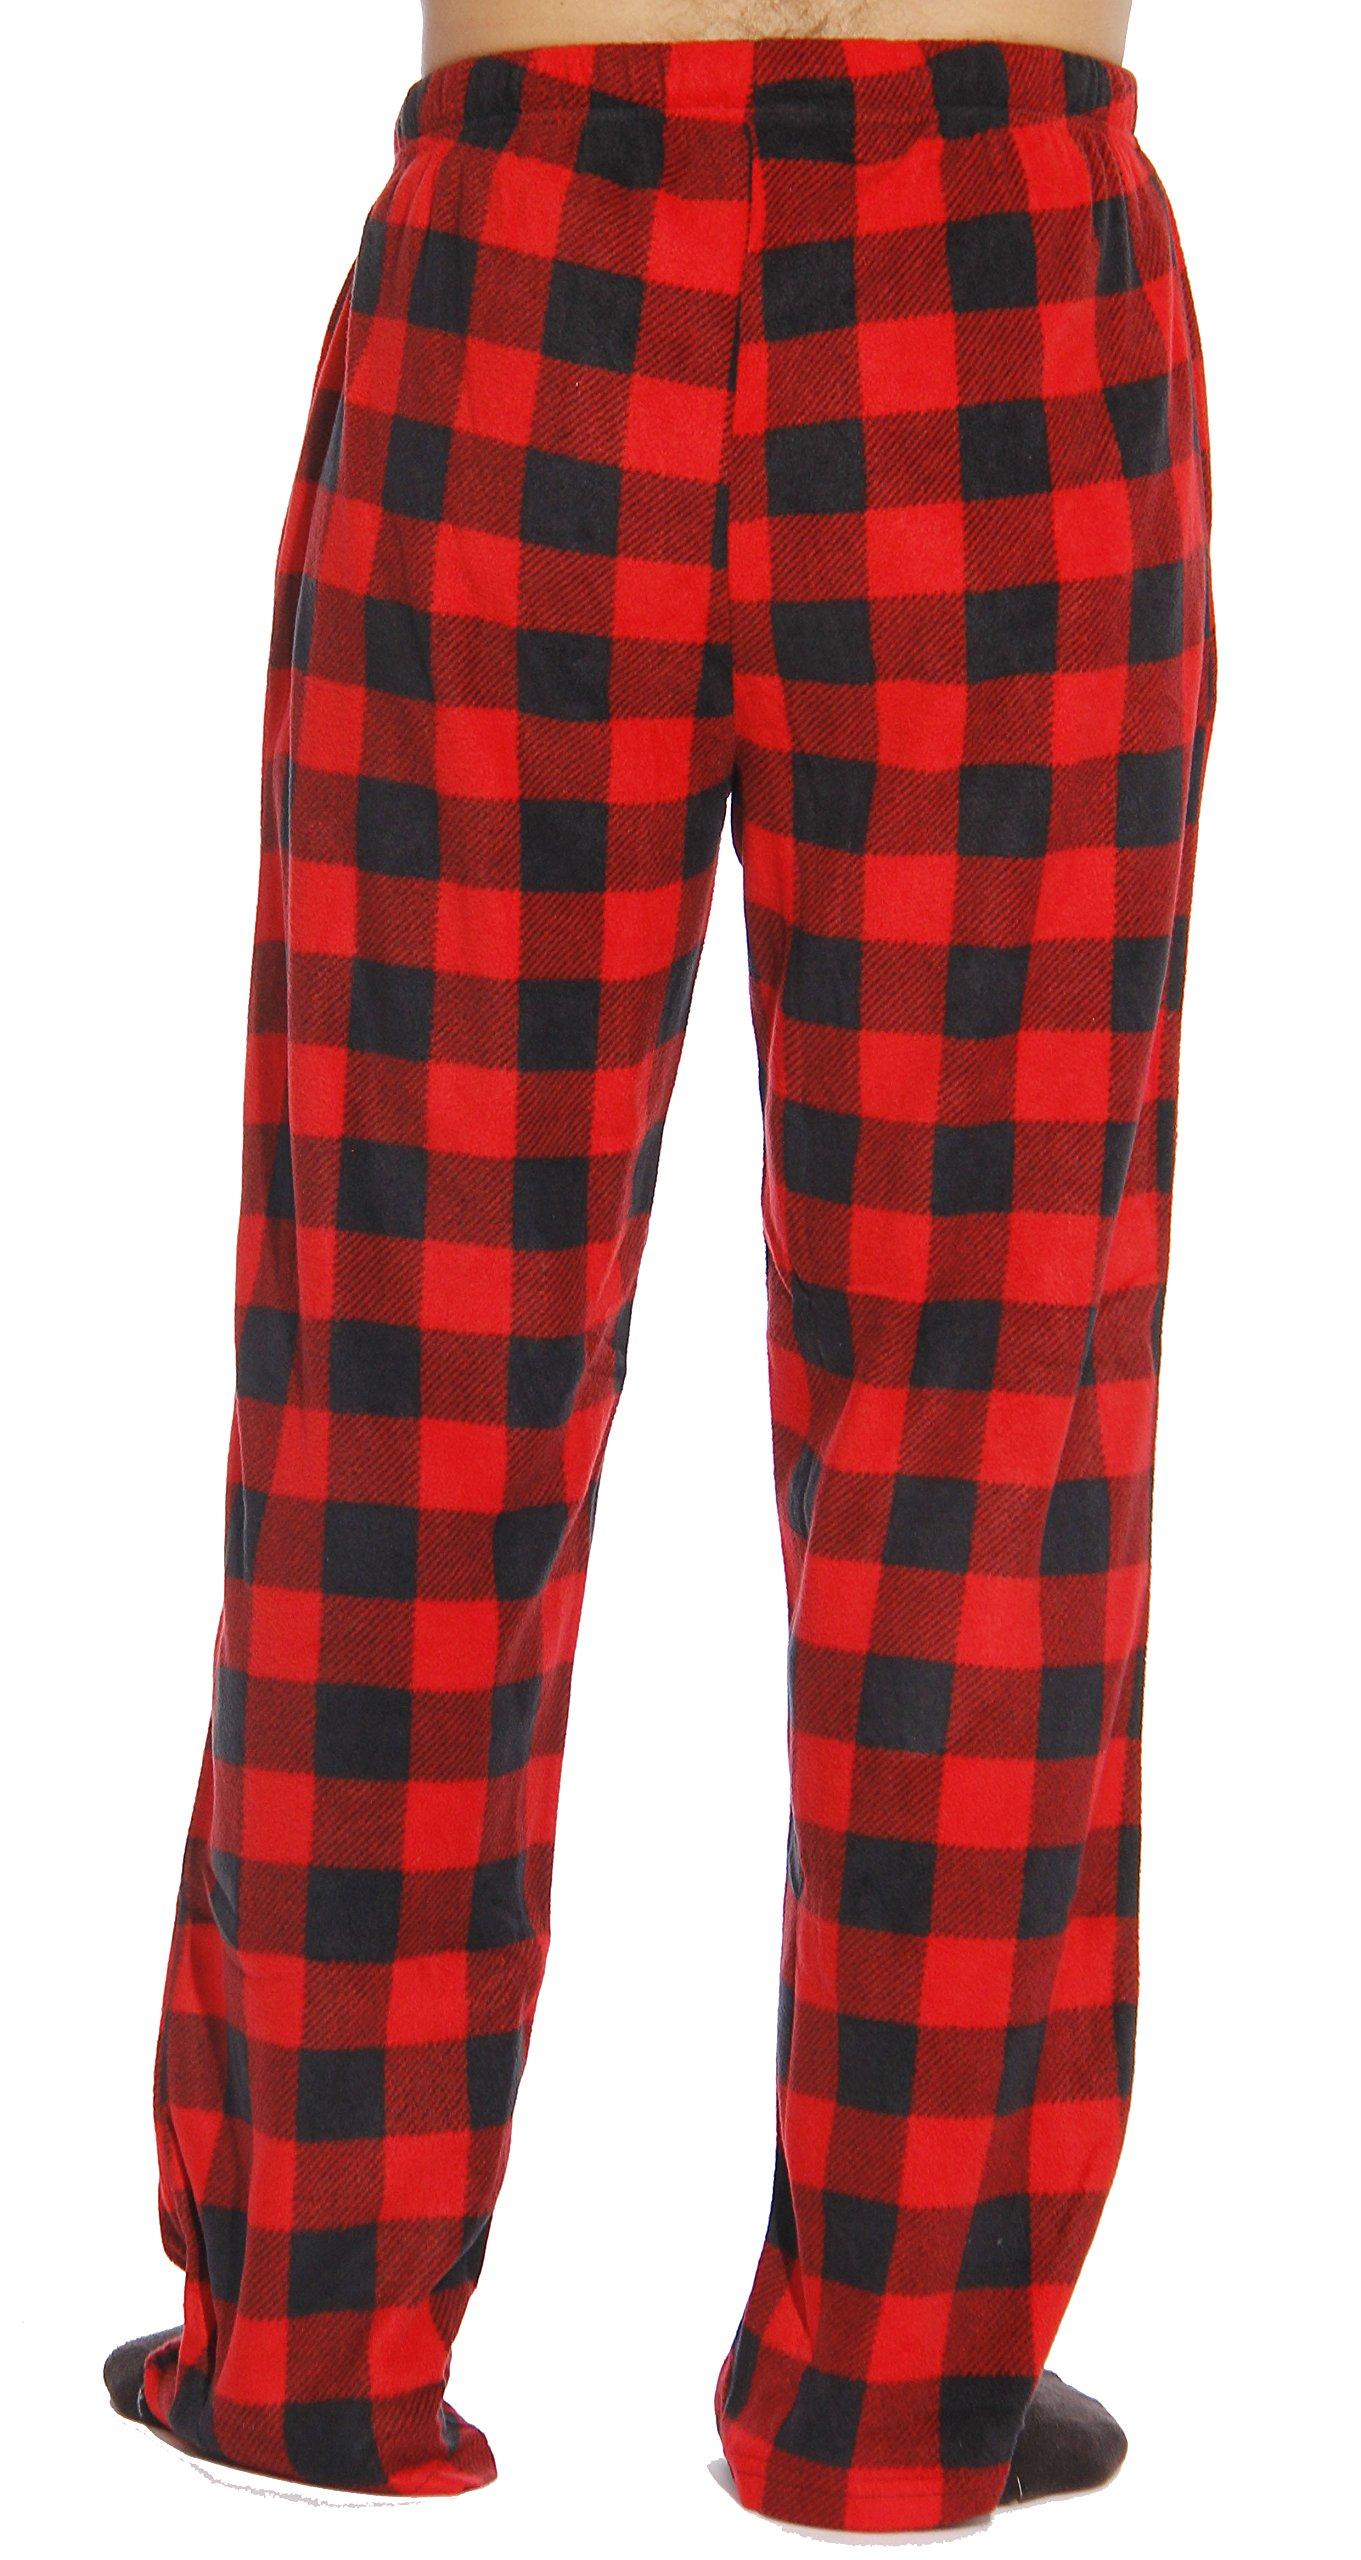 #FollowMe 45902-1A-M Polar Fleece Pajama Pants for Men/Sleepwear/PJs, Red Buffalo Plaid, Medium by #followme (Image #3)